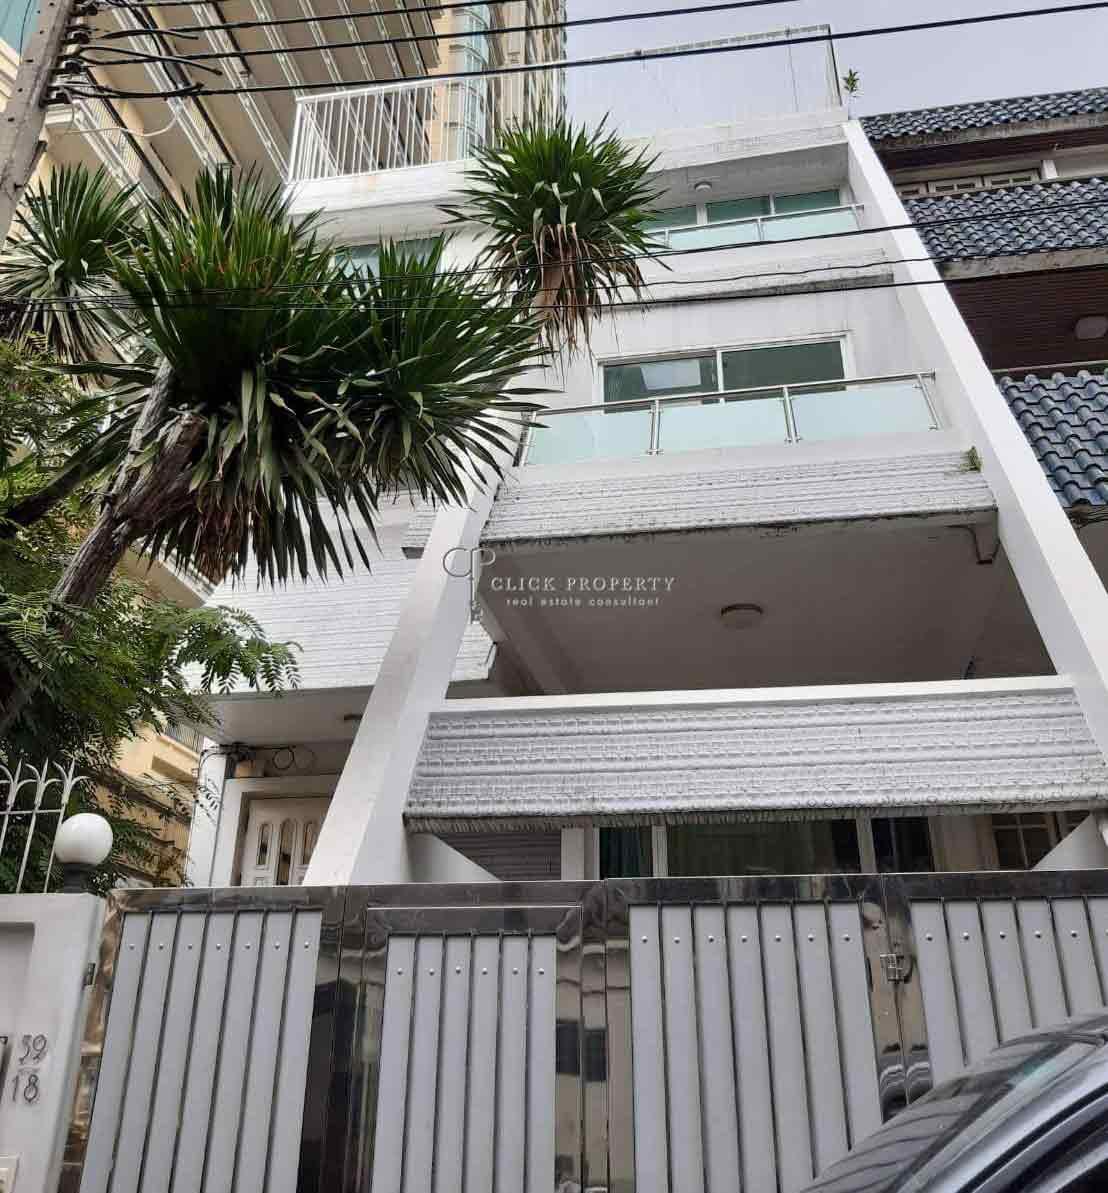 ✦6beds 4baths✦ FOR RENT Townhome 4.5ชั้น @ Sukhumvit soi 31 Next to Royce Condominium | ให้เช่า บ้าน